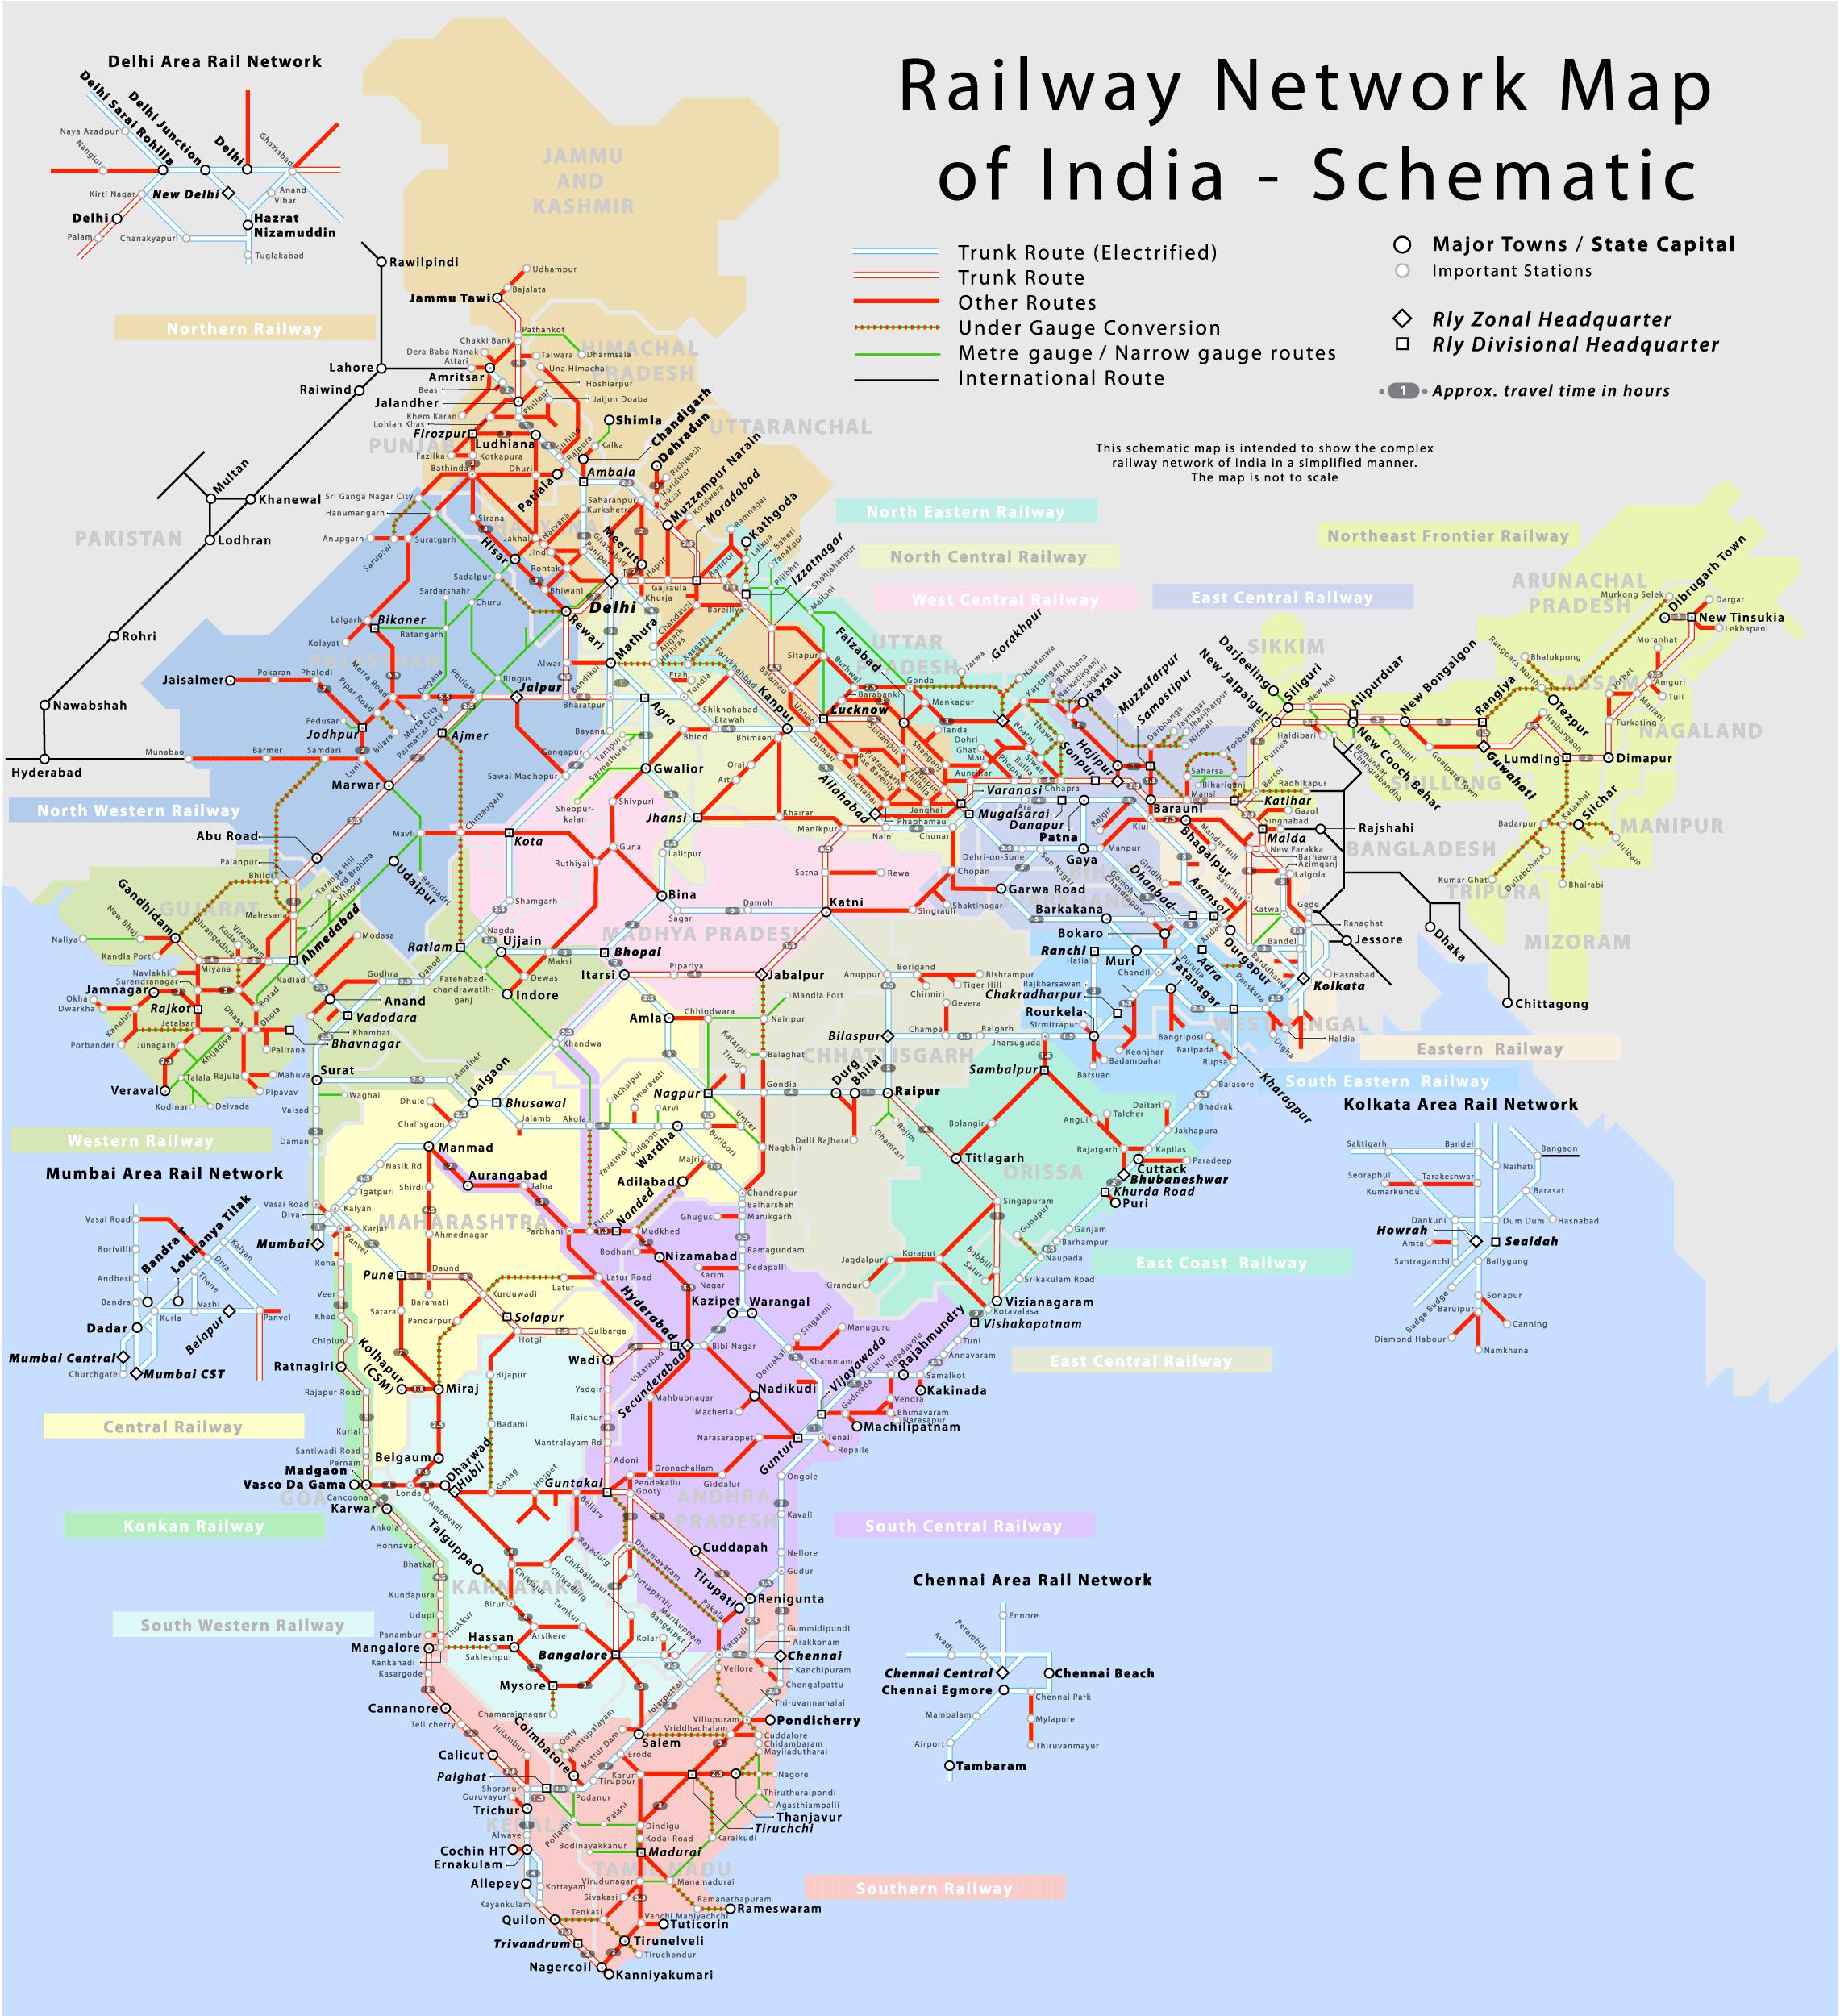 Carte Ferroviaire Deurope.Inde Reseau Ferroviaire Carte Populationdata Net